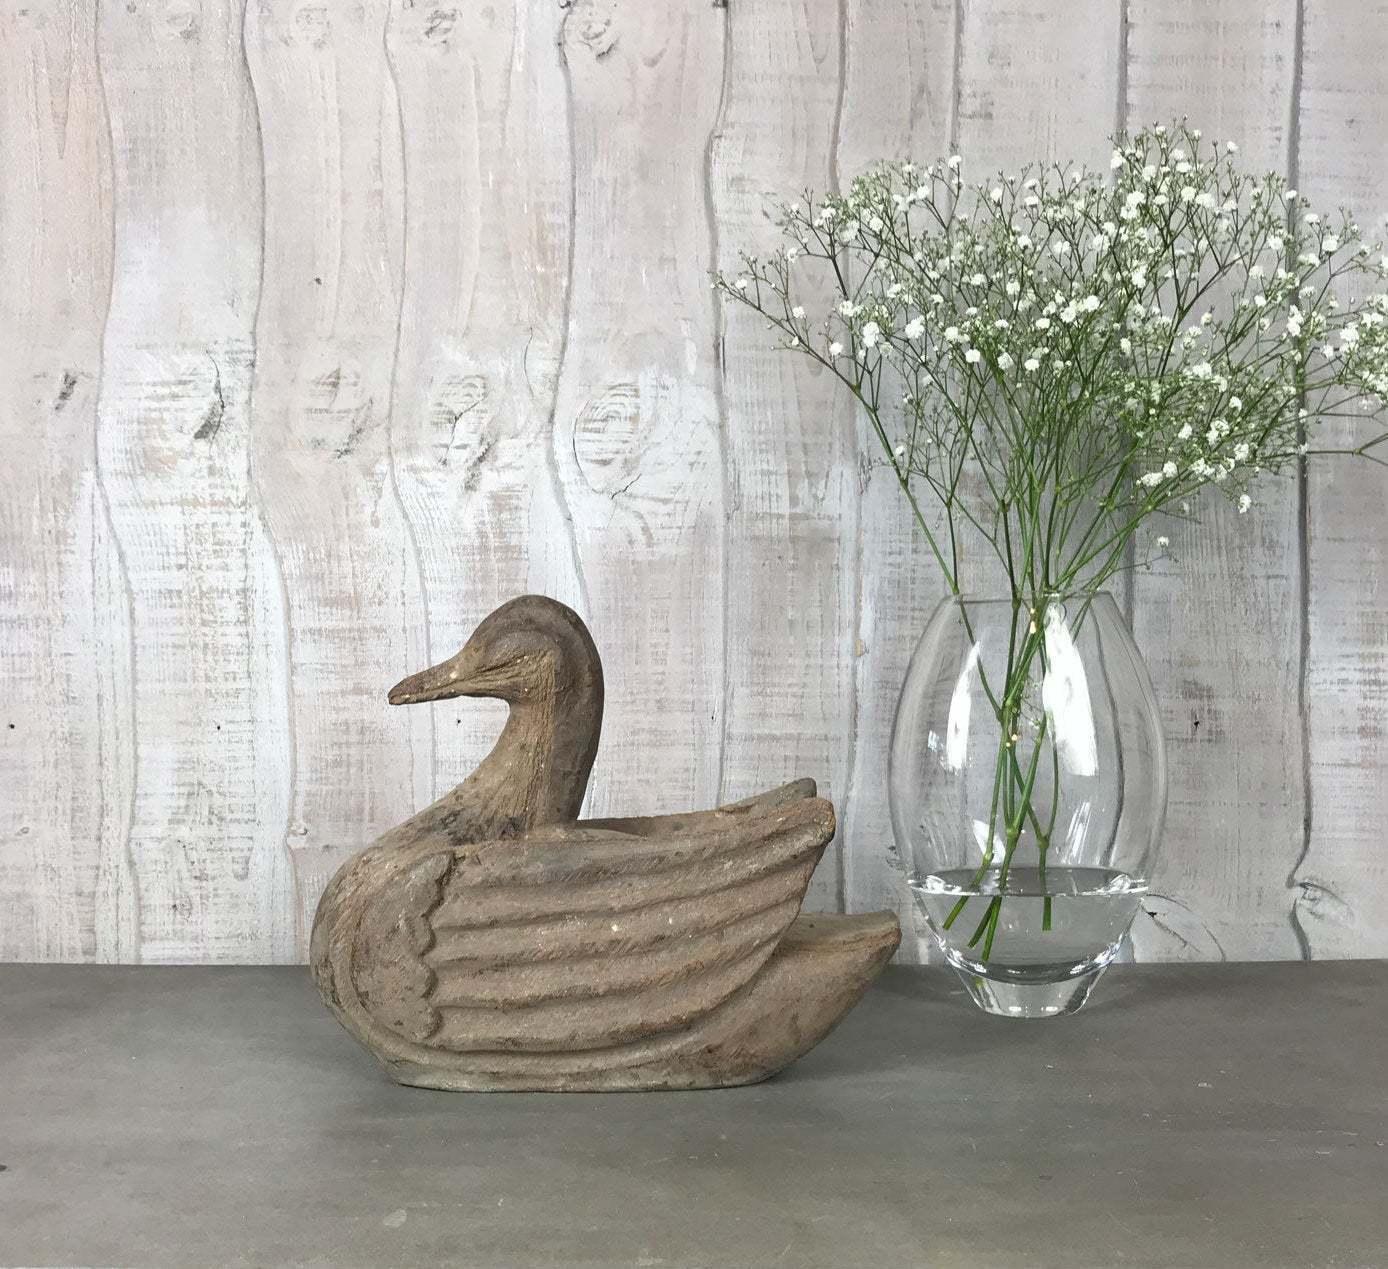 Vintage Antique Decorative Hand Carved Wooden Duck